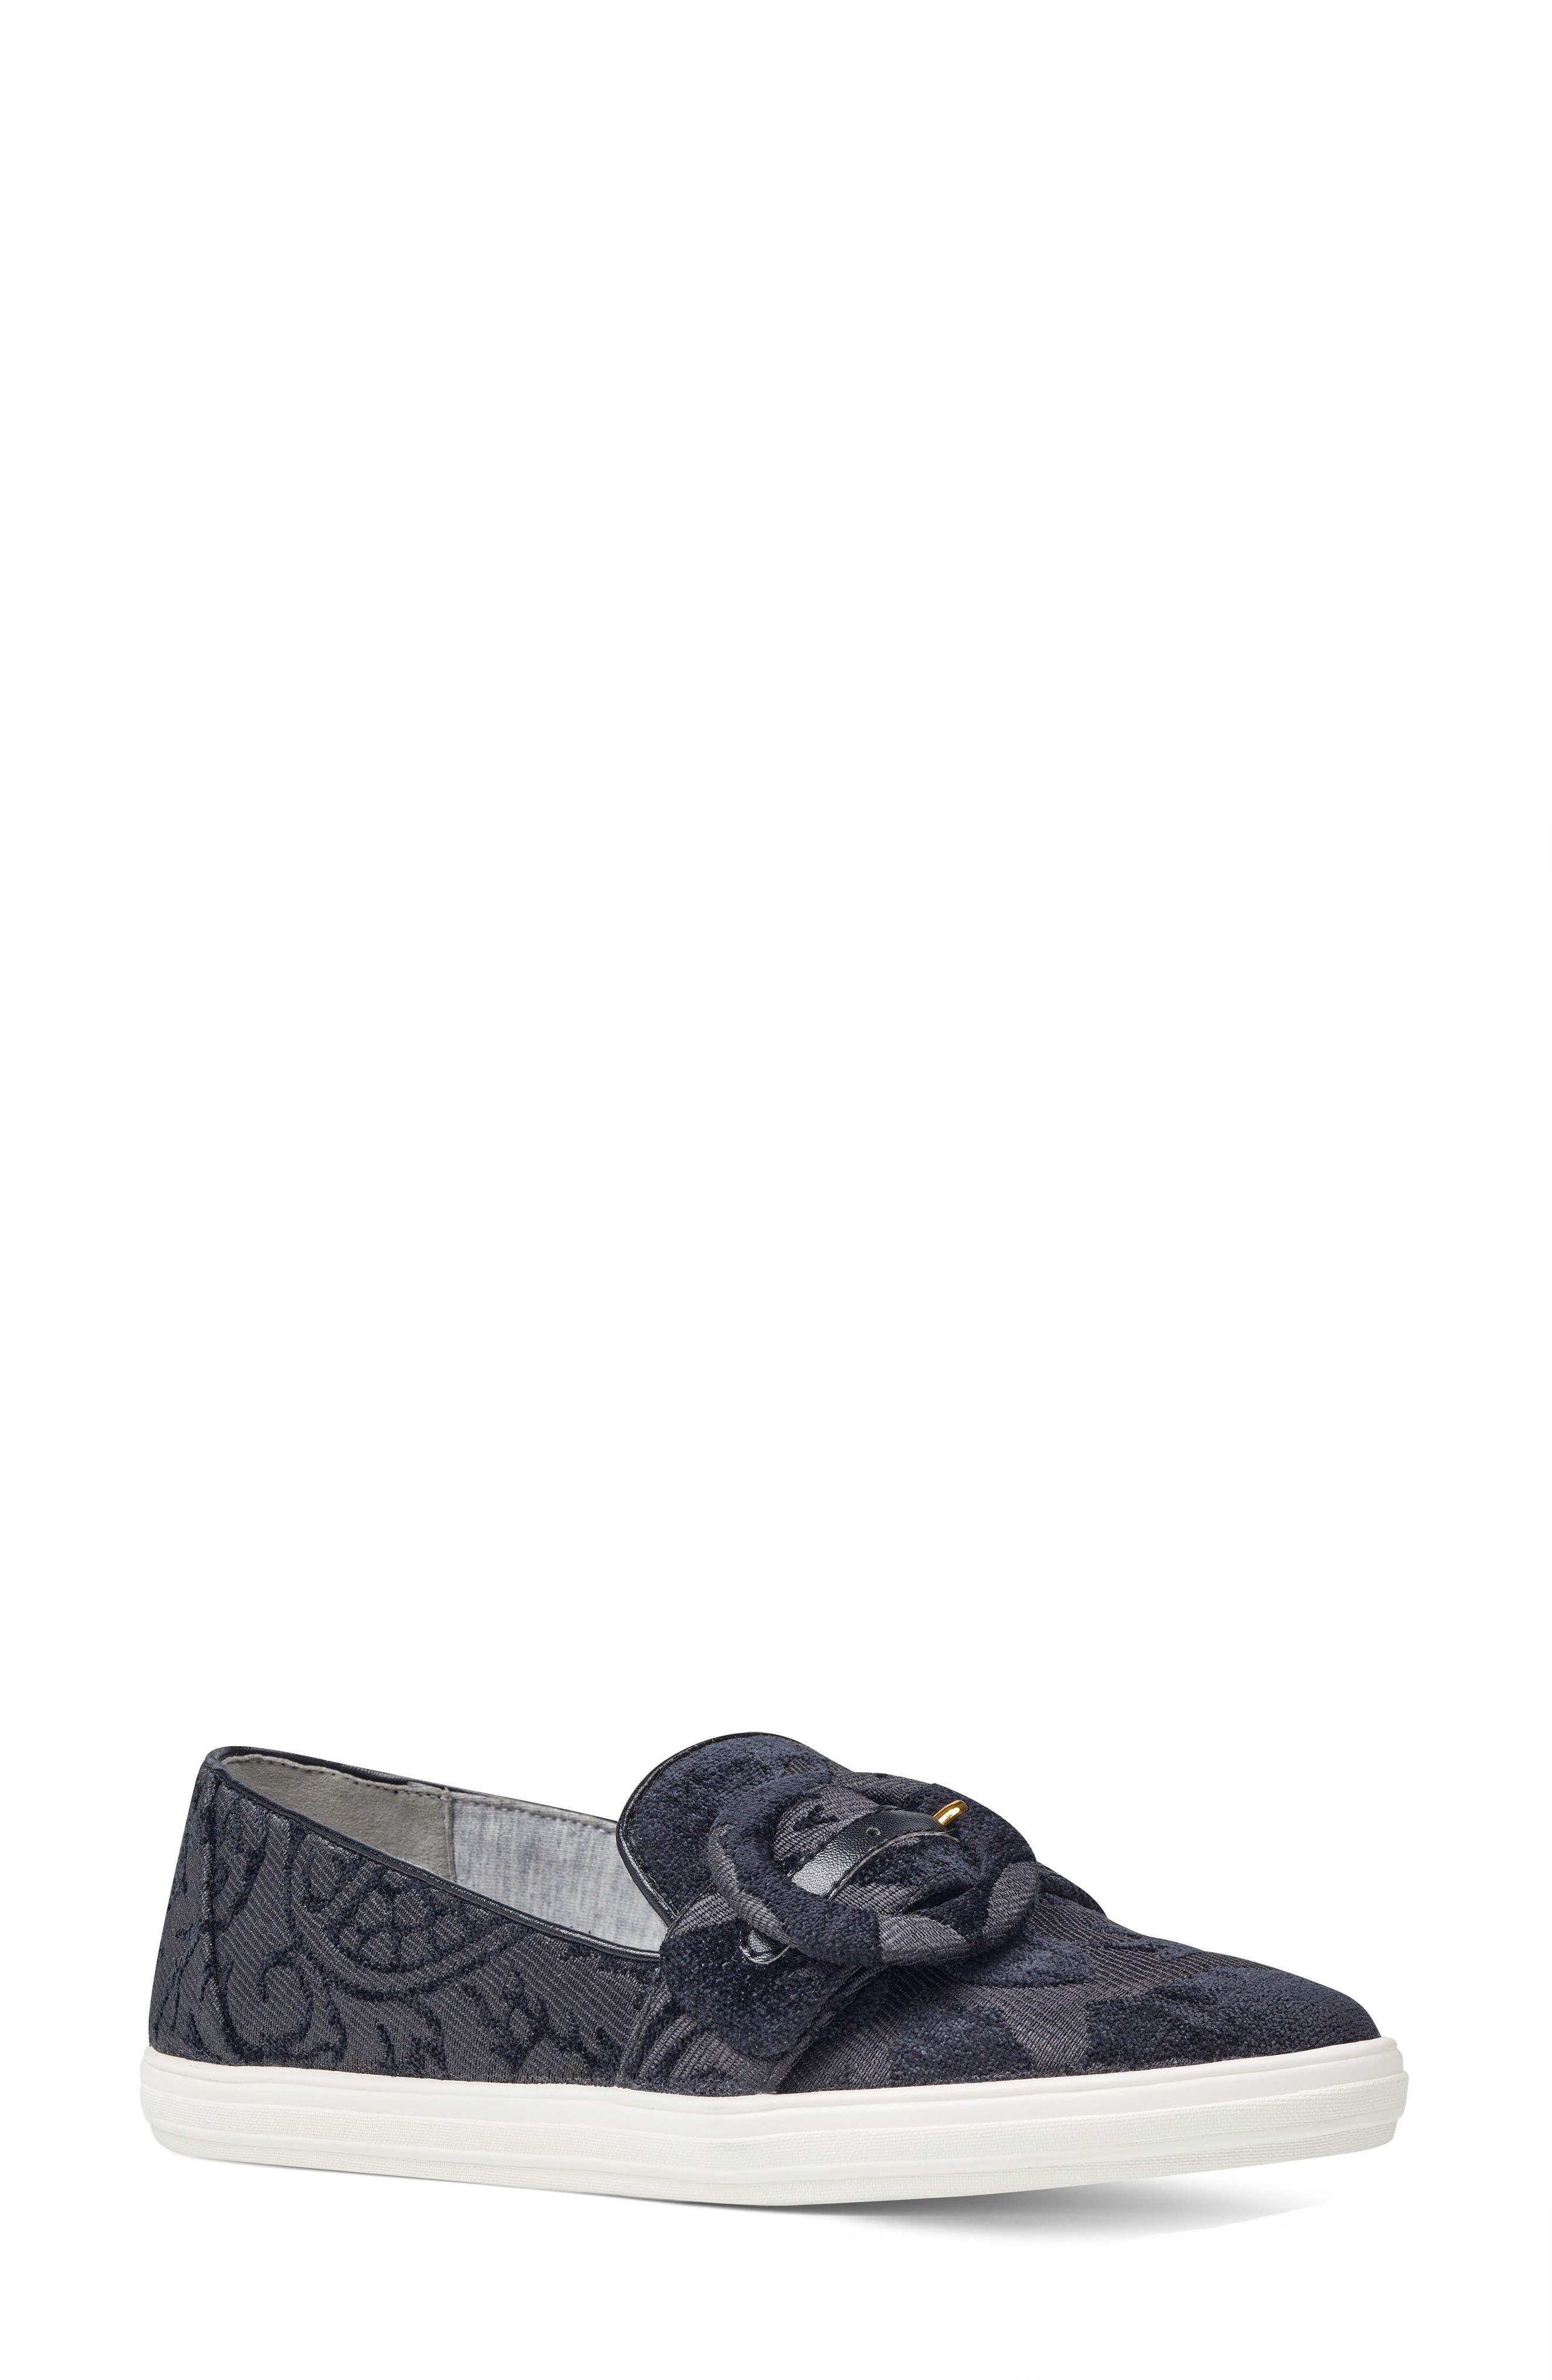 Shireene Slip-On Sneaker,                             Main thumbnail 1, color,                             002